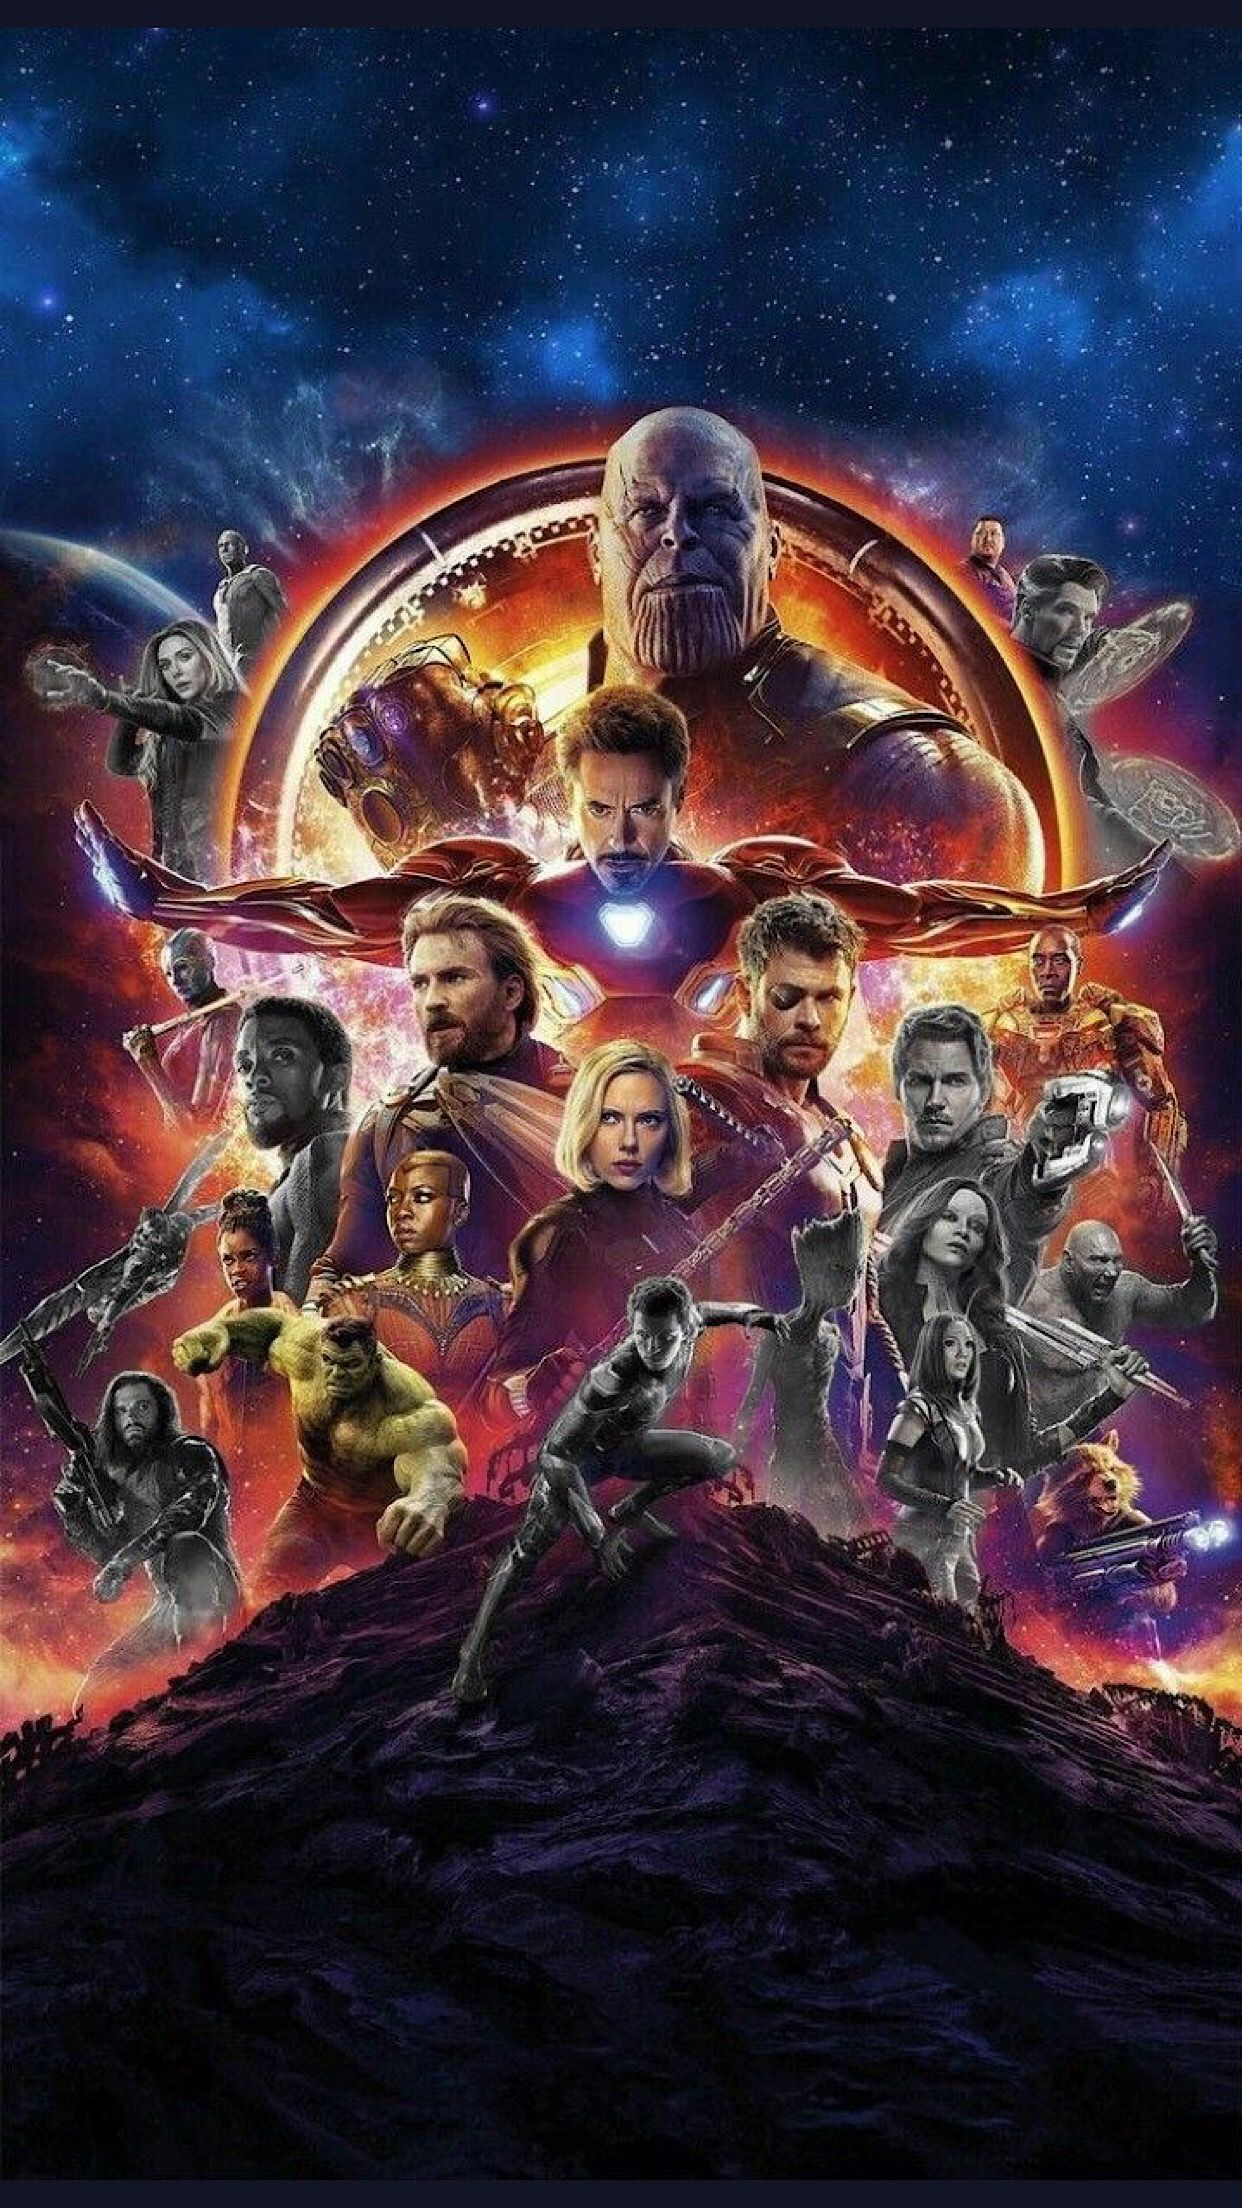 Pin By Tarick Prendergast On Marvel Iphone Wallpapers Avengers